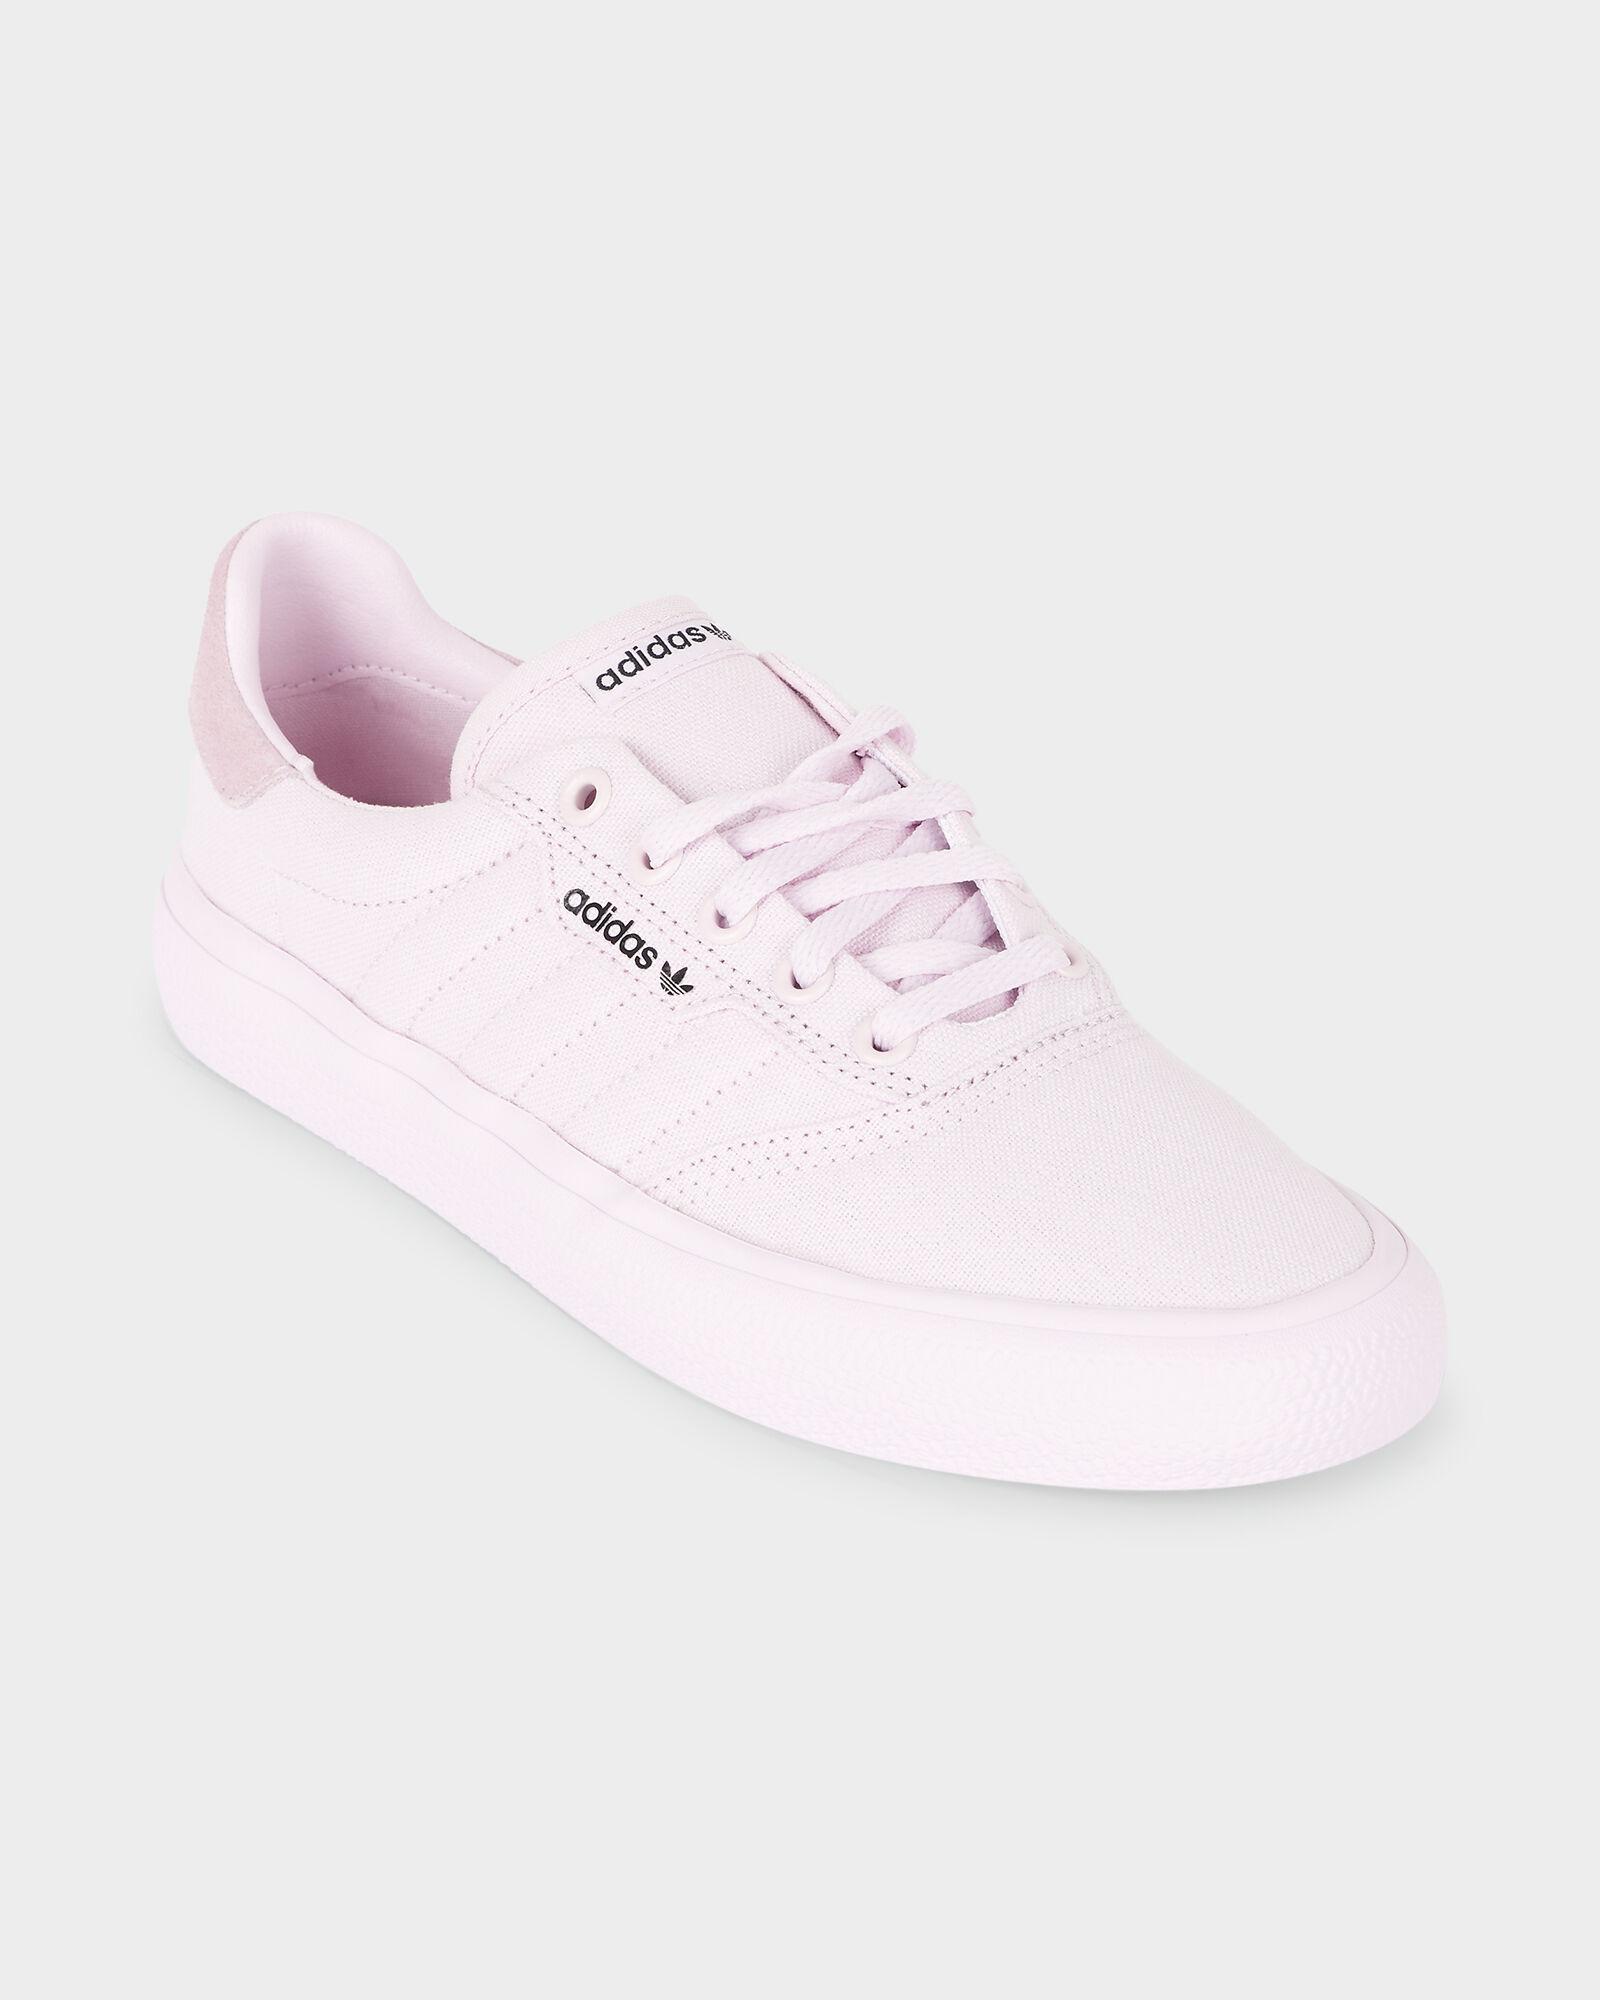 Aero Pink/aero Pink/ ADIDAS 3MC WOMENS